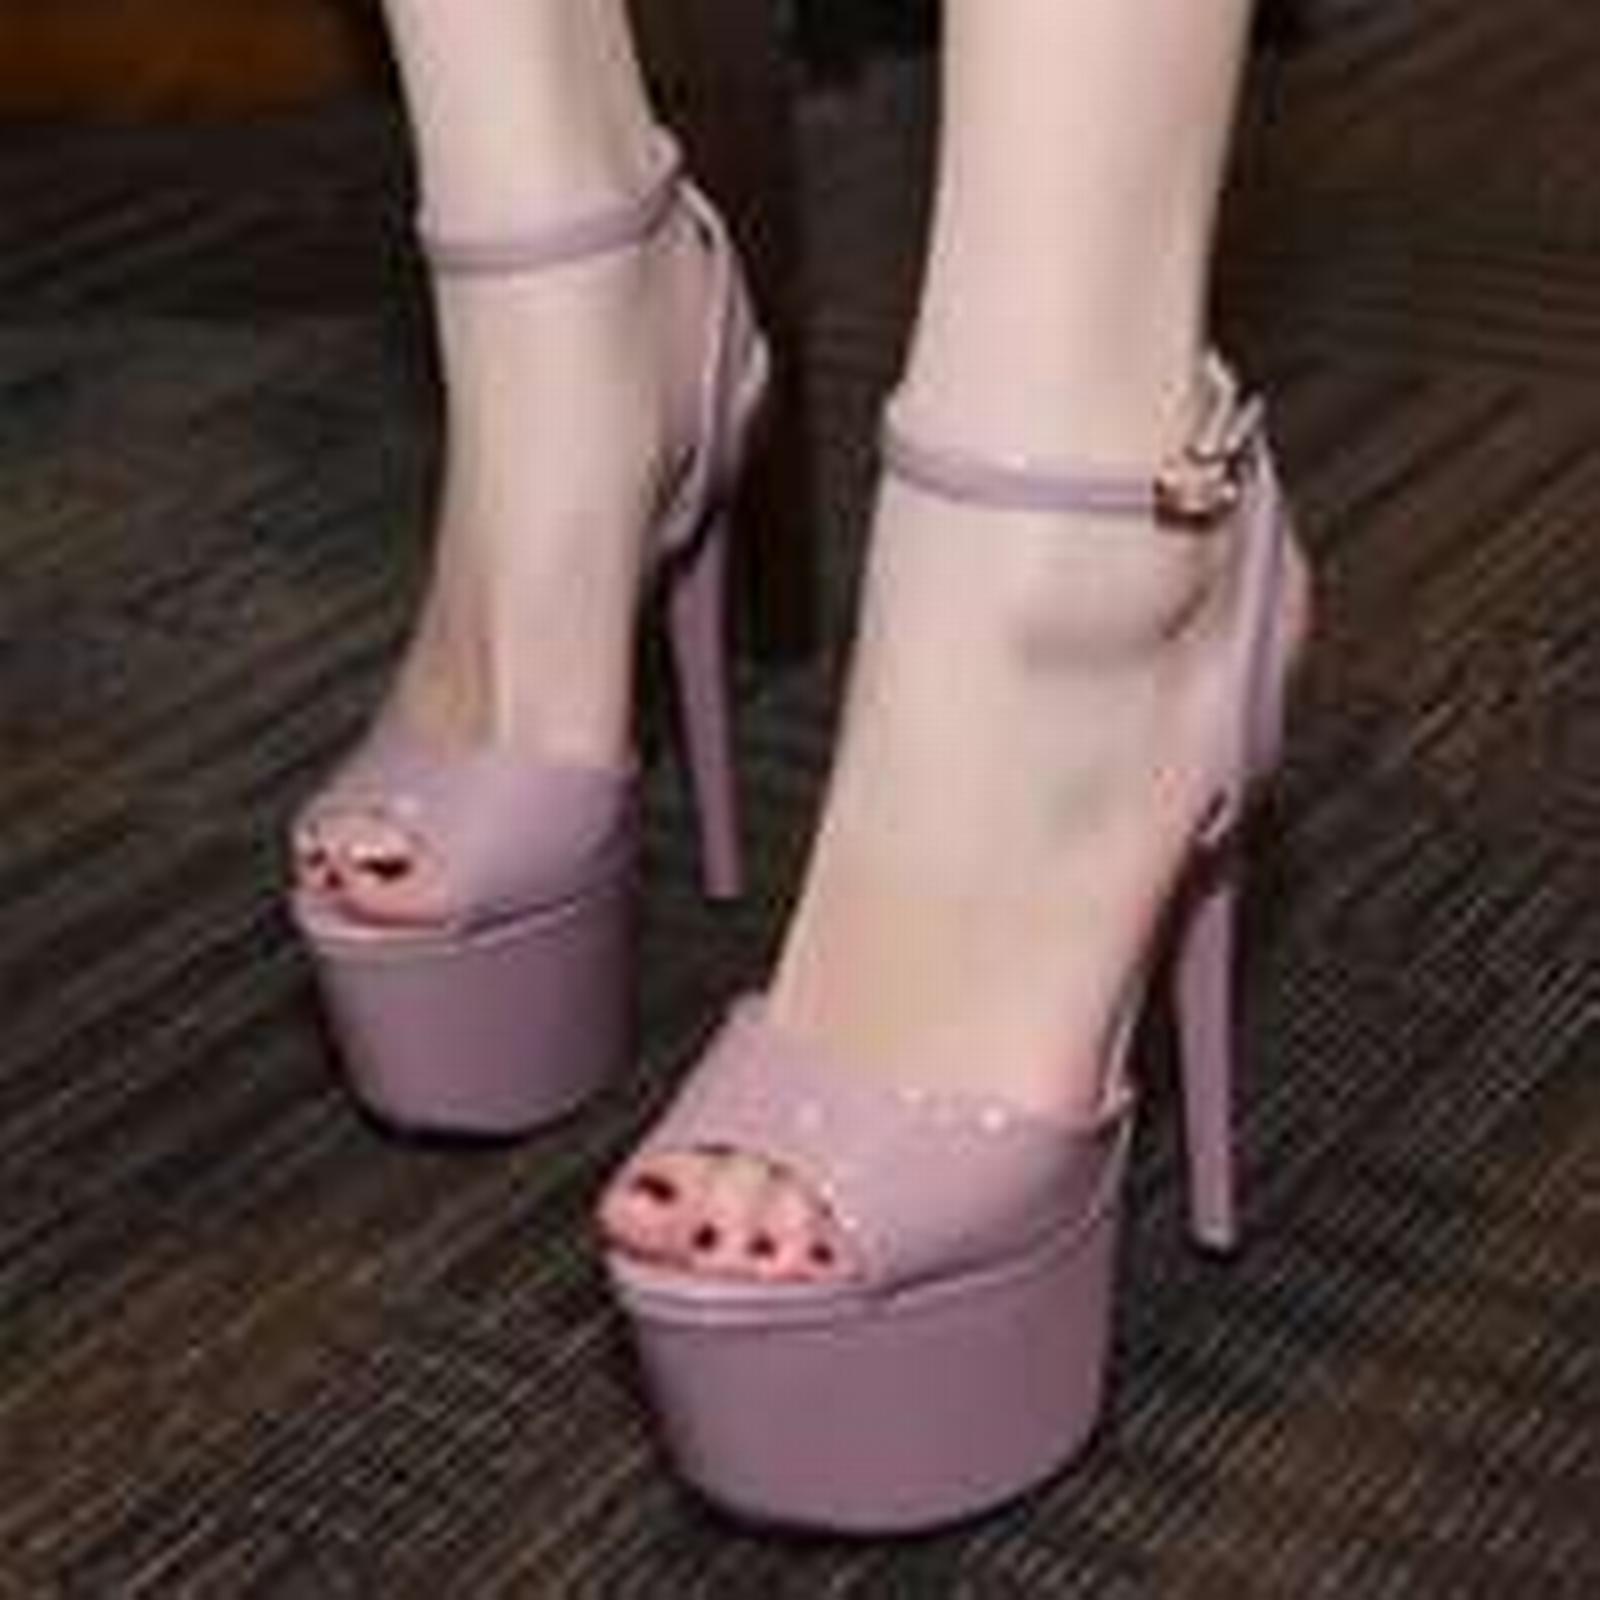 Bonanza (Global) ps306 Sexy supper high heels sandals, 17 cm violet heels, US size 4-8, violet cm 0983f4